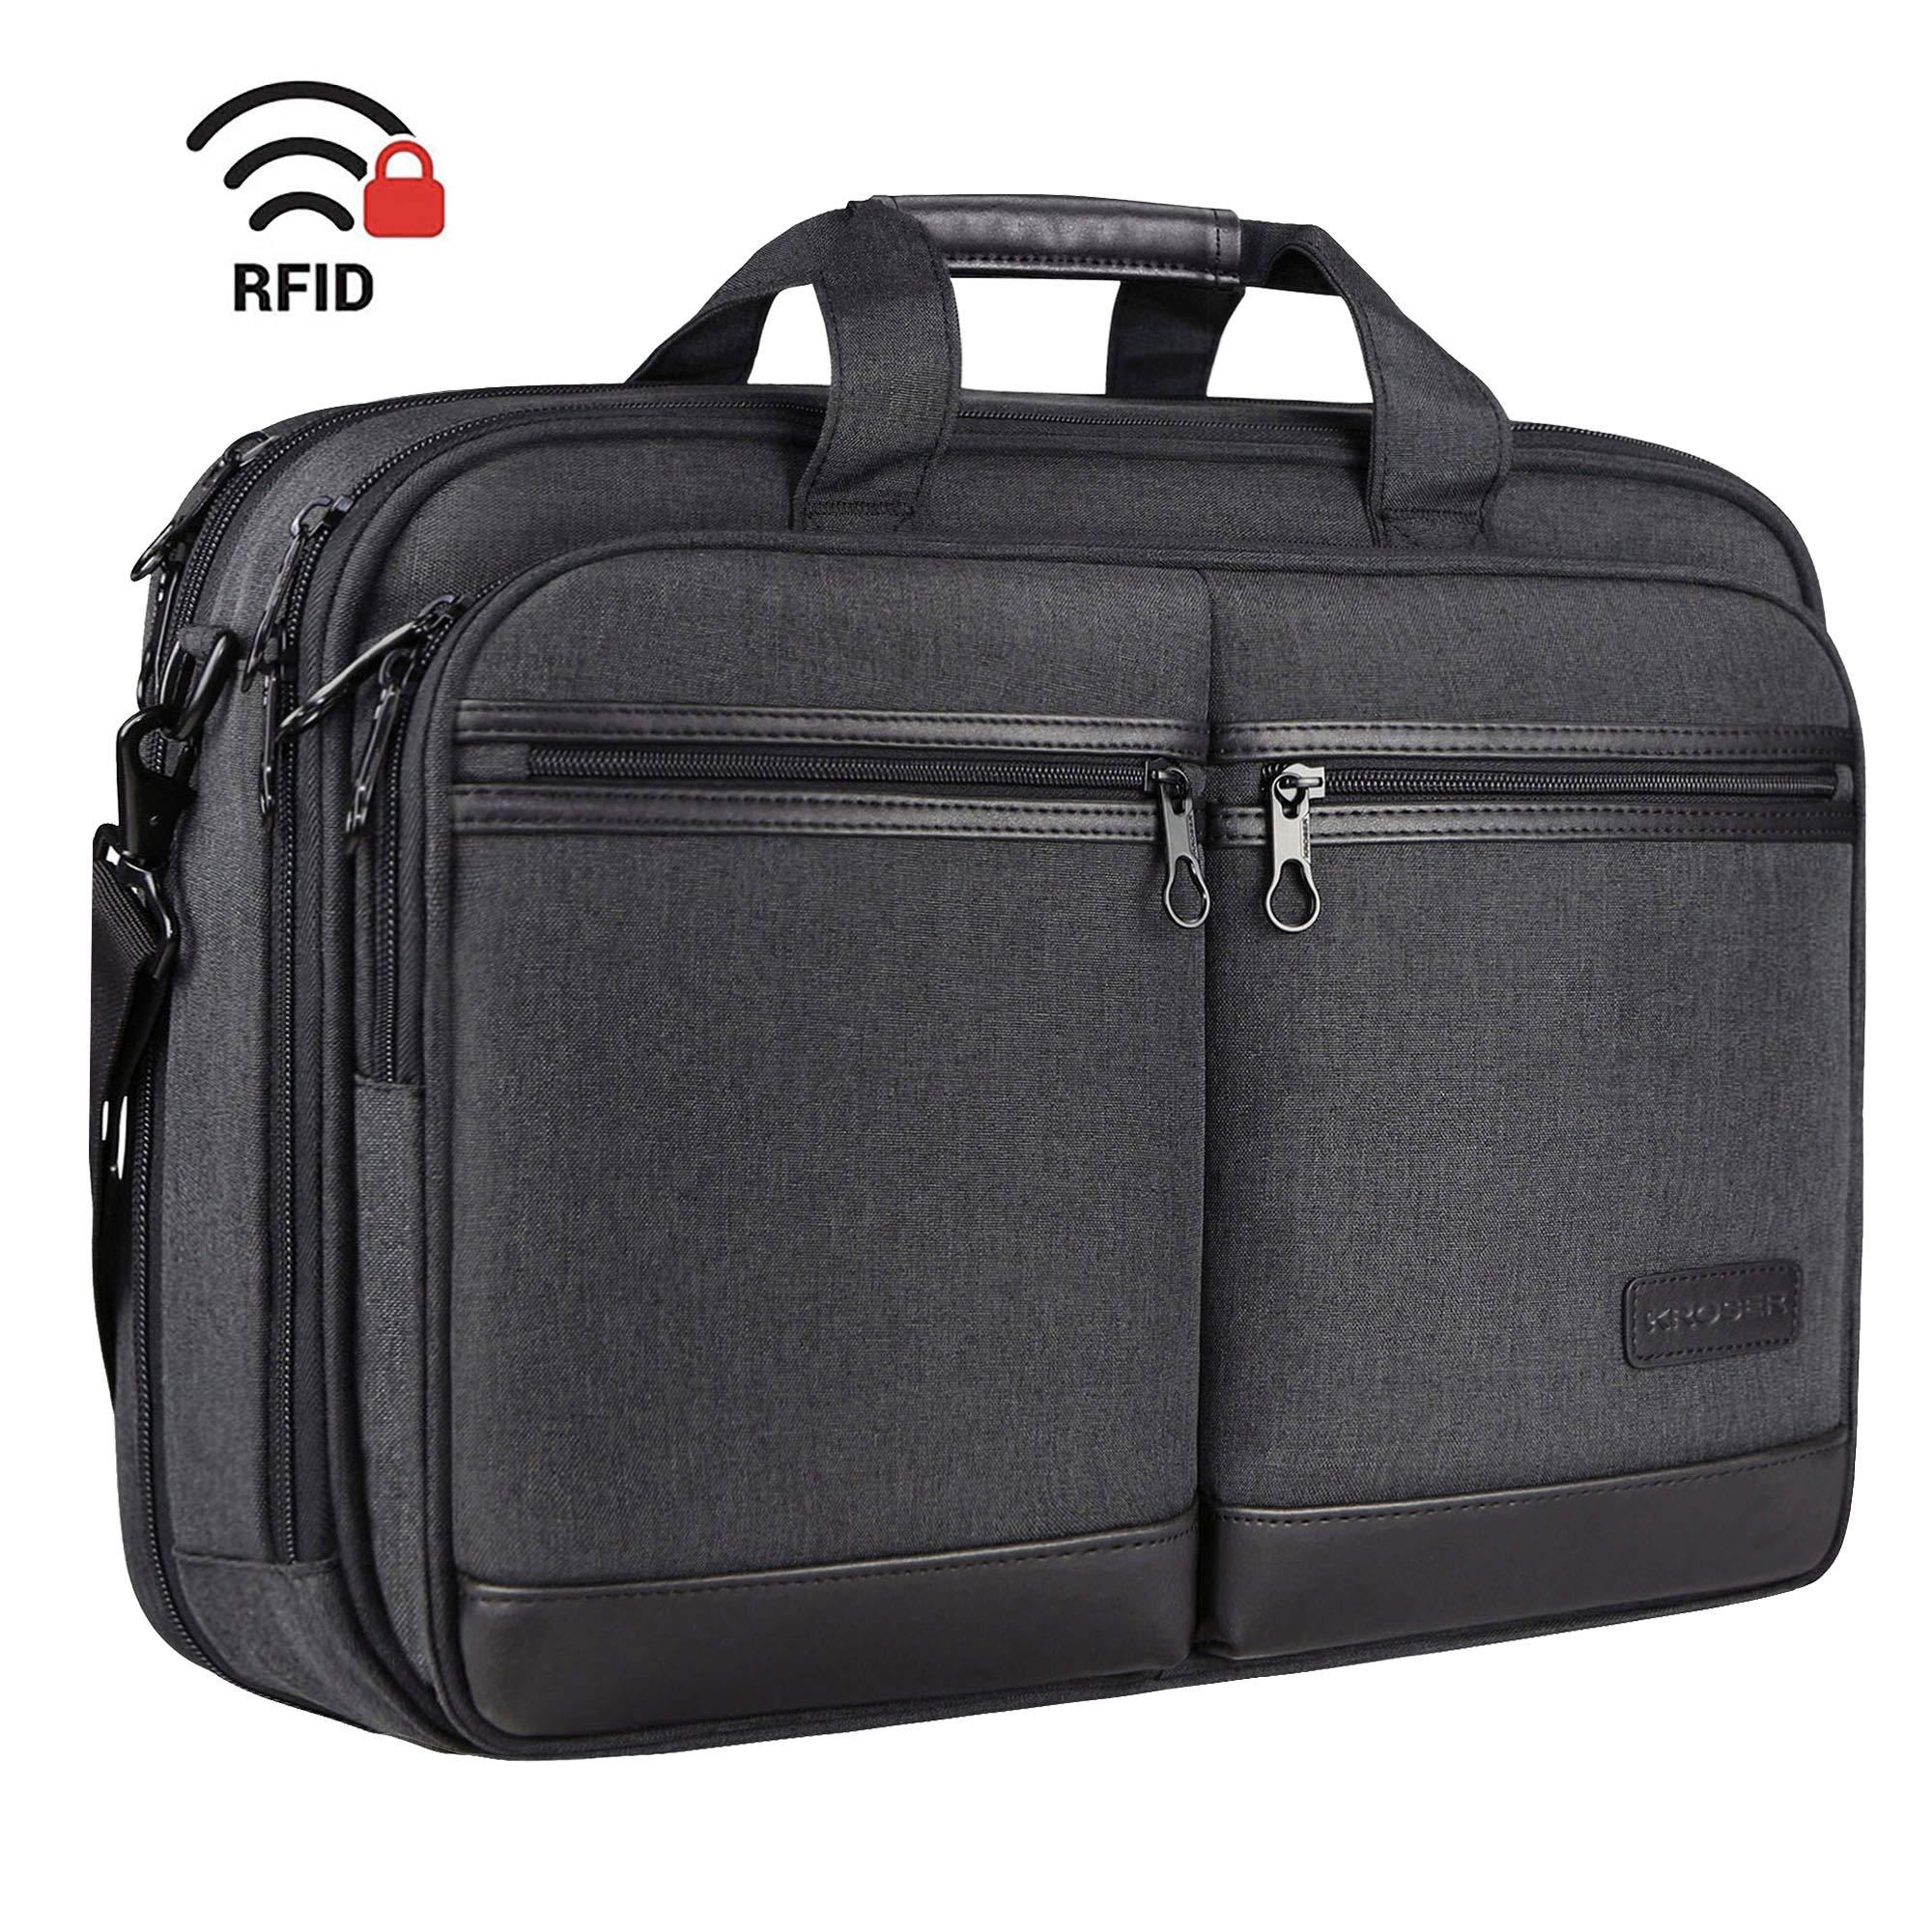 KROSER 18'' Laptop Bag Stylish Laptop Briefcase Fits Up to 17.3 Inch Expandable Water-Repellent Shoulder Messenger Bag Computer Bag with RFID Pockets for Business/Travel/School/College/Men/Women-Black